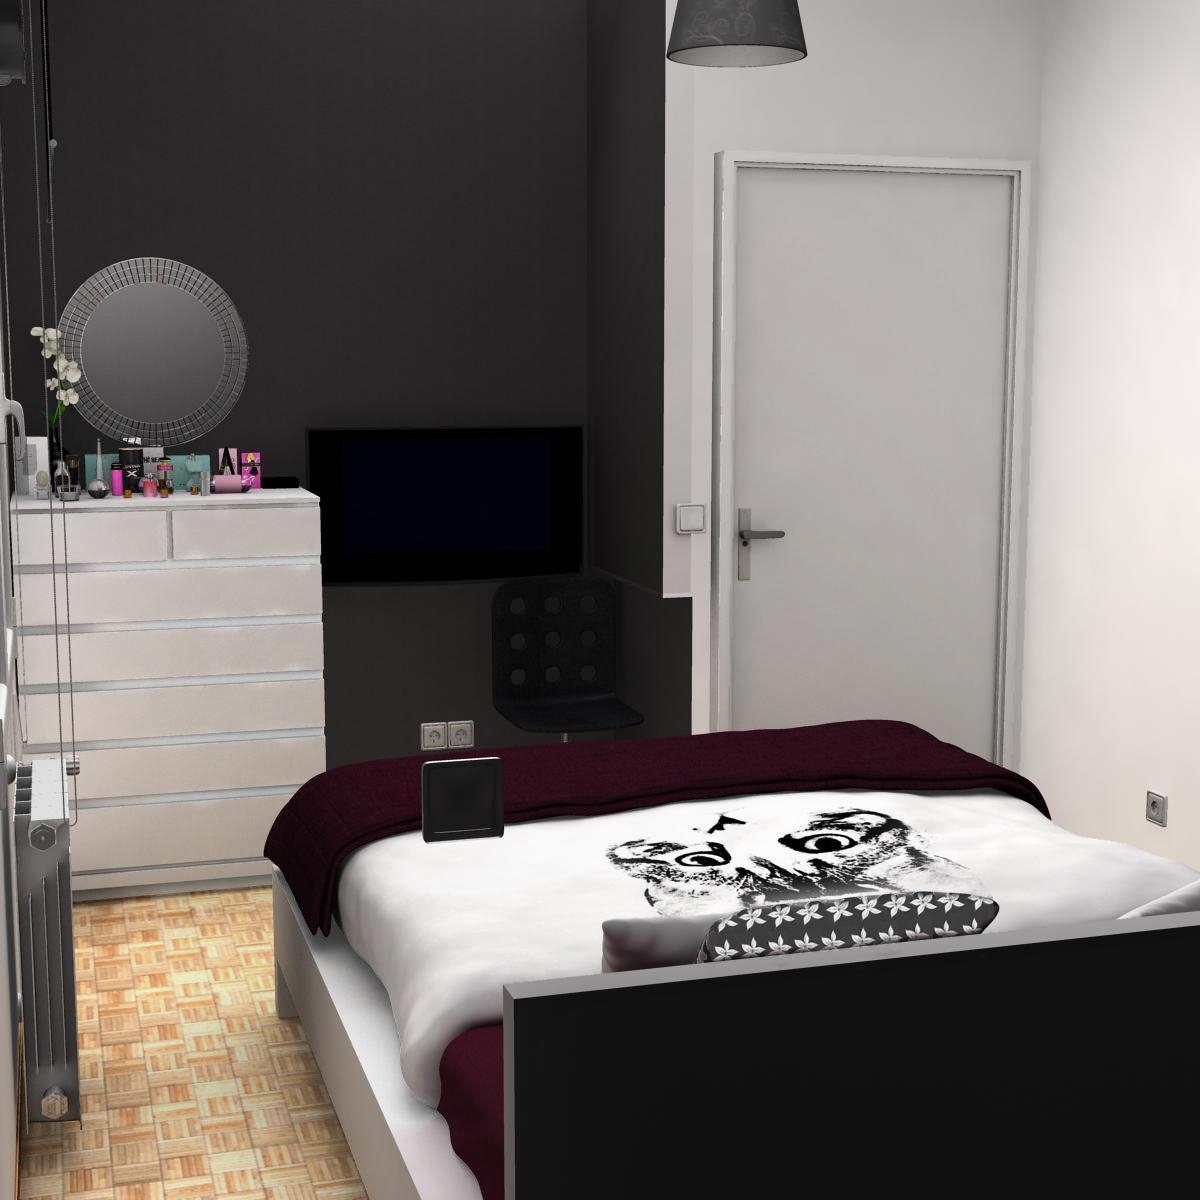 guļamistaba 8 3d modelis 3ds max fbx c4d ma mb obj 159561